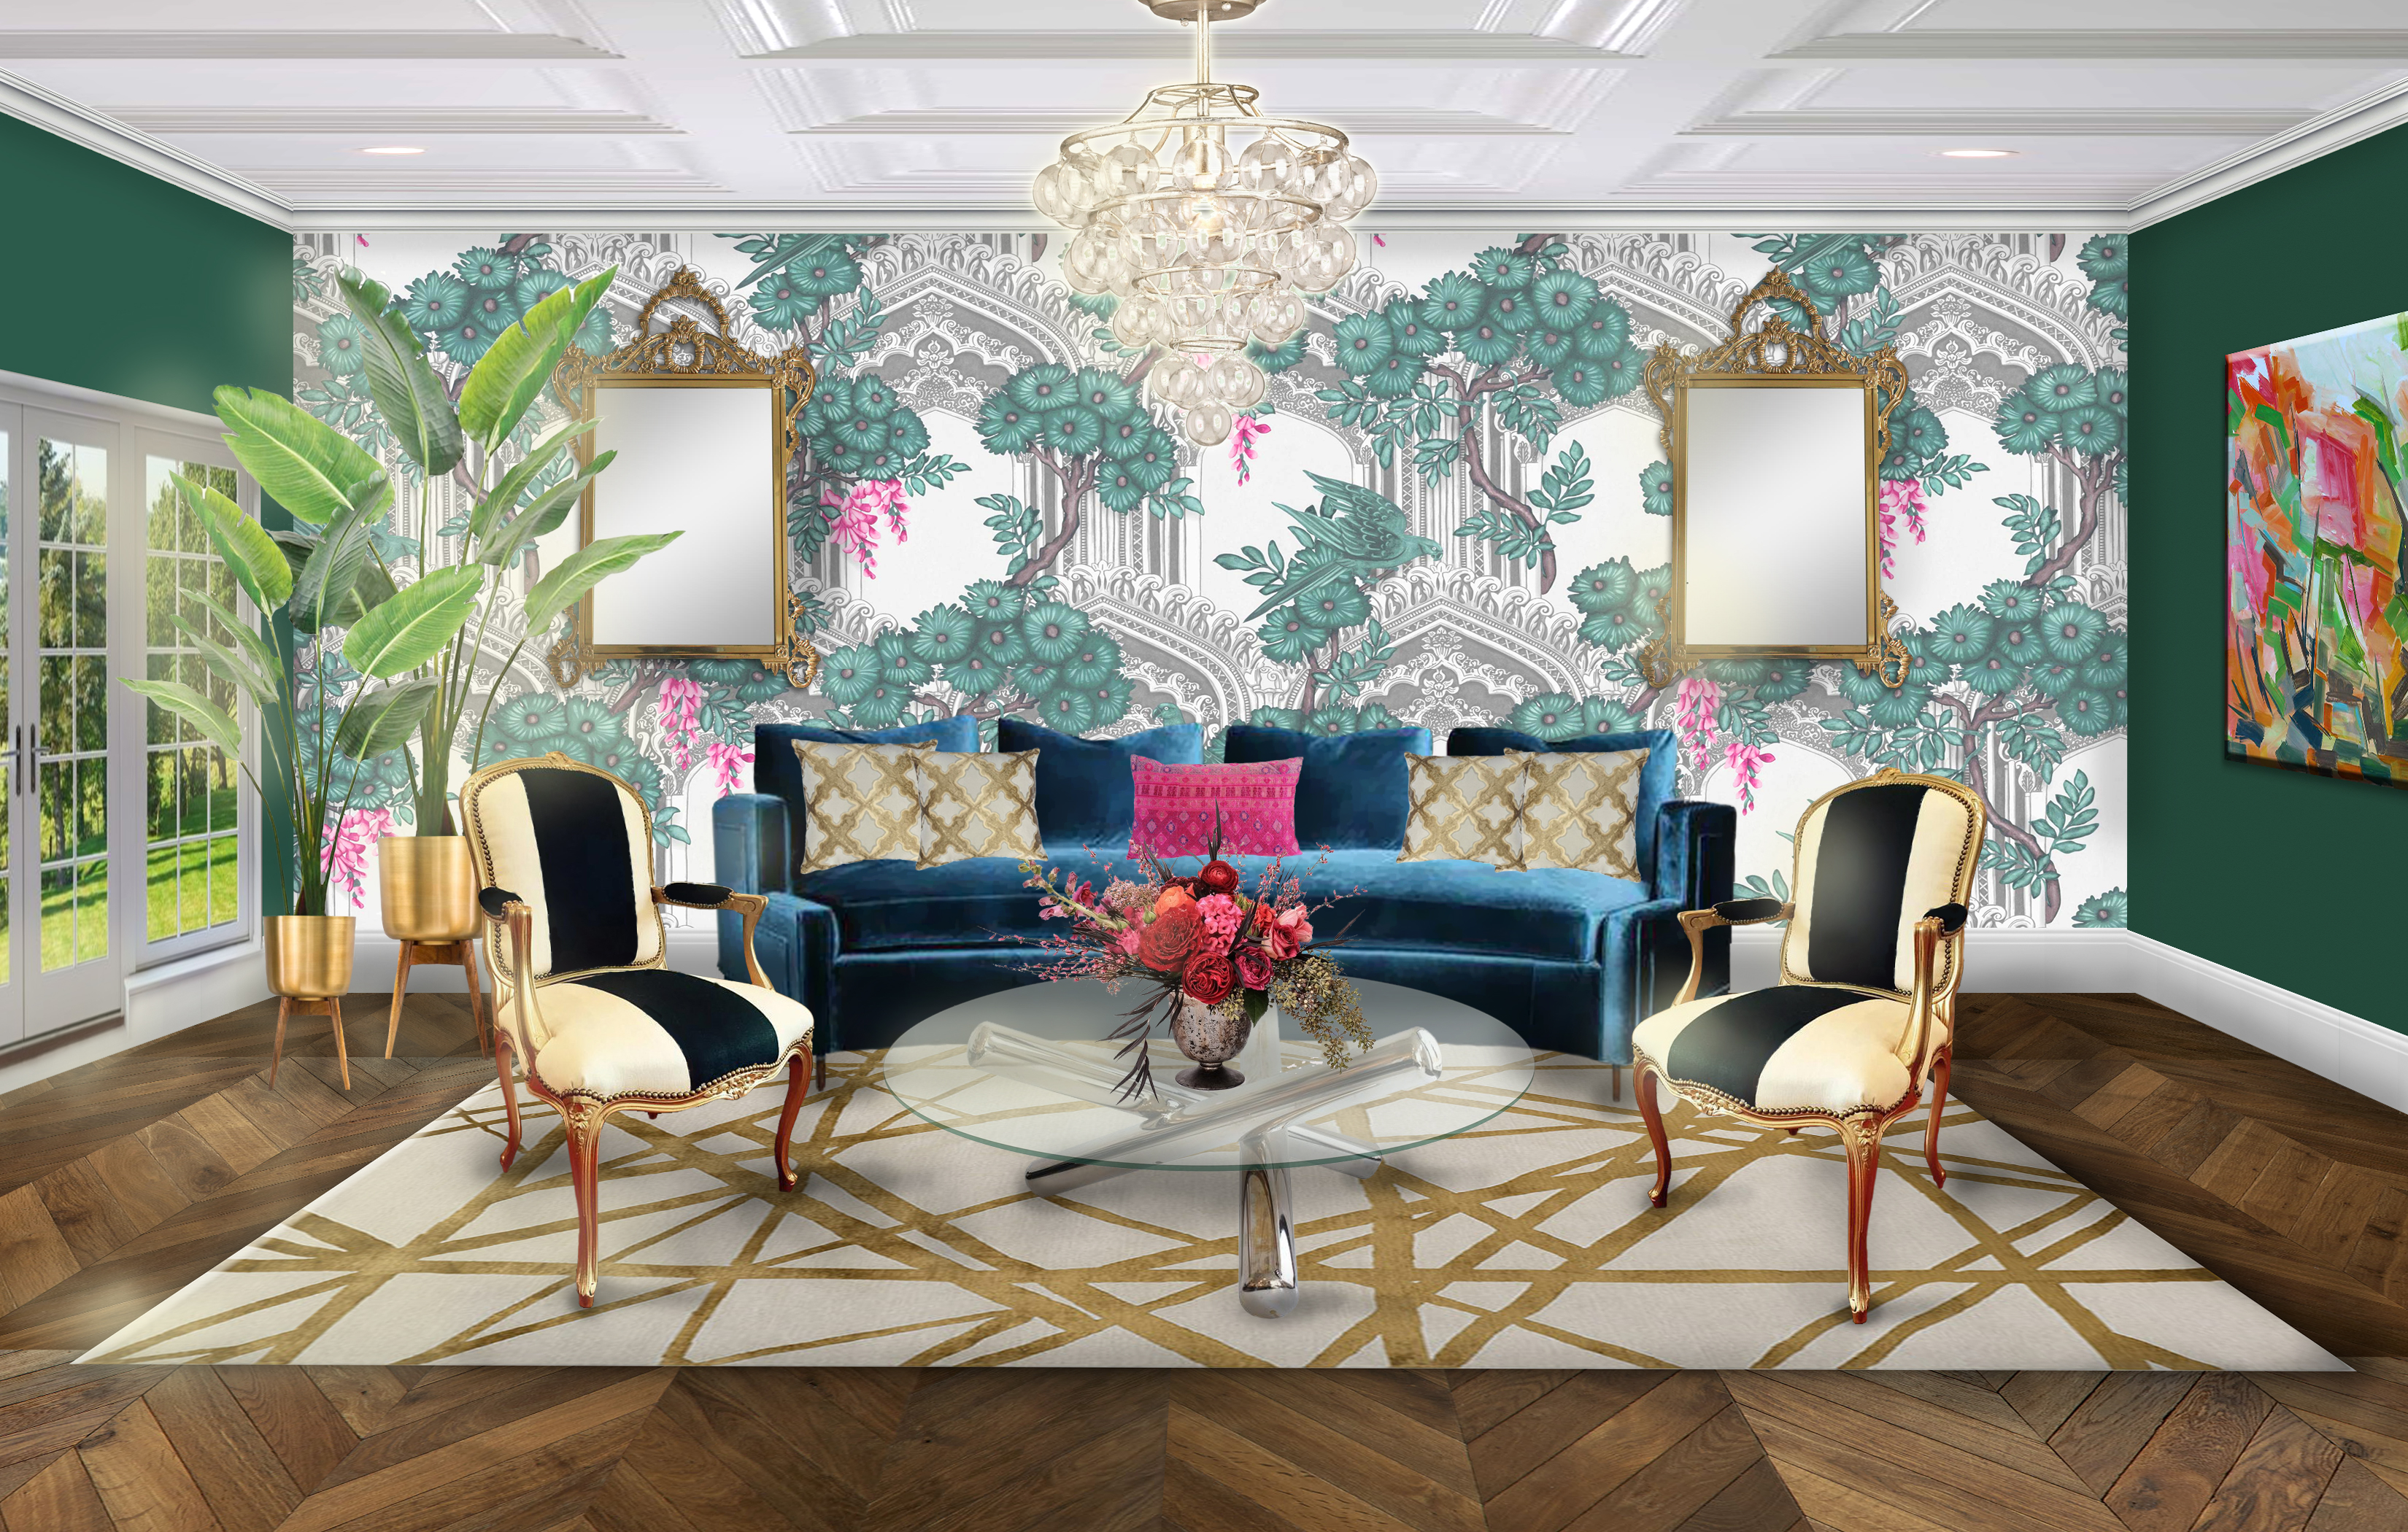 AW Design Studio Interior Design Dallas. FloorPlanAWdesignStudioDallas. ISl6fm39qbz1oo1000000000 & Home Plans \u0026 Interior Design - AW Design Studio